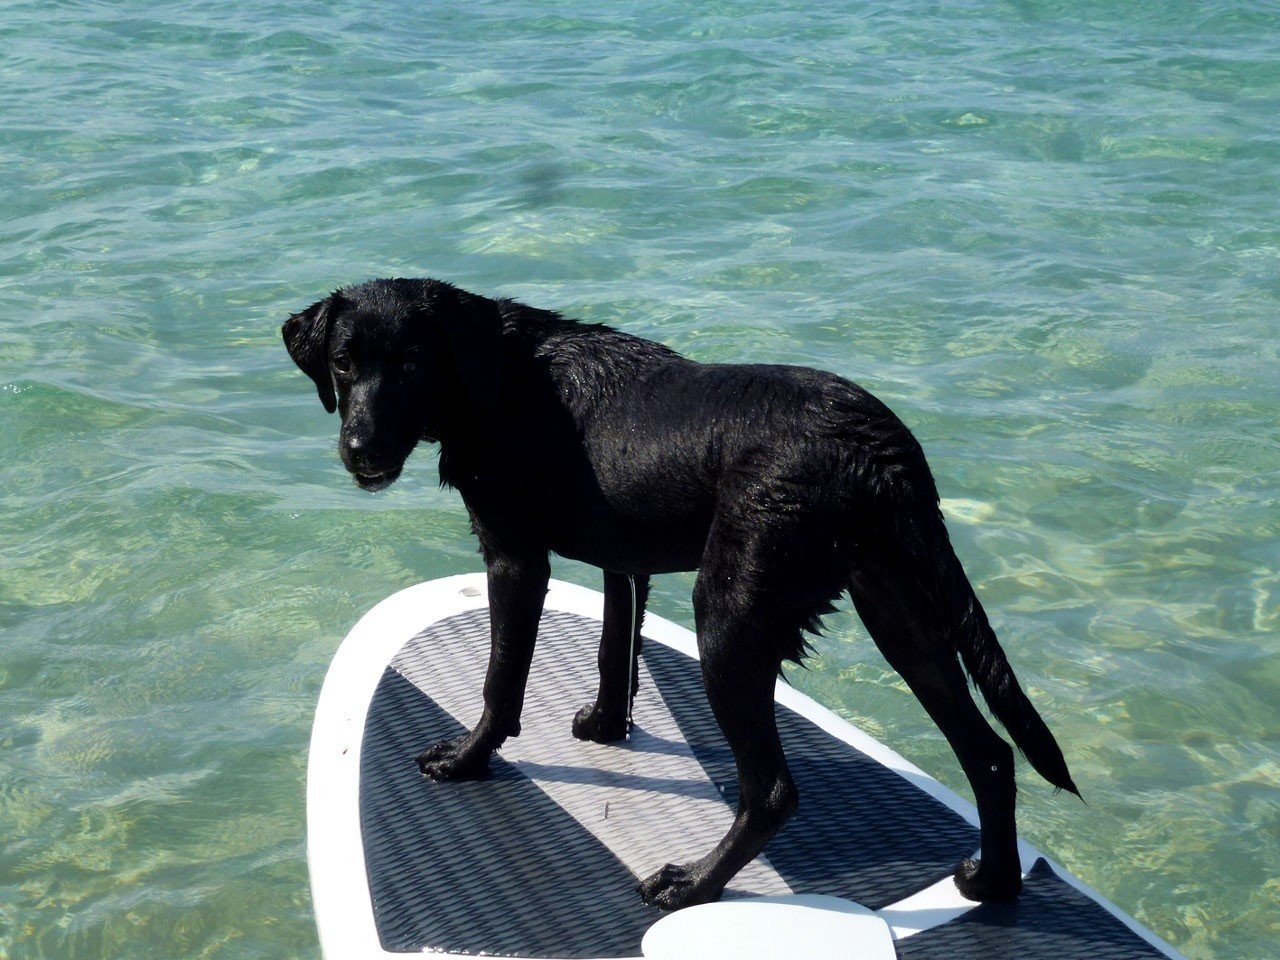 Offbeat water Dog mammal vertebrate outdoor black newfoundland labrador retriever dog like mammal